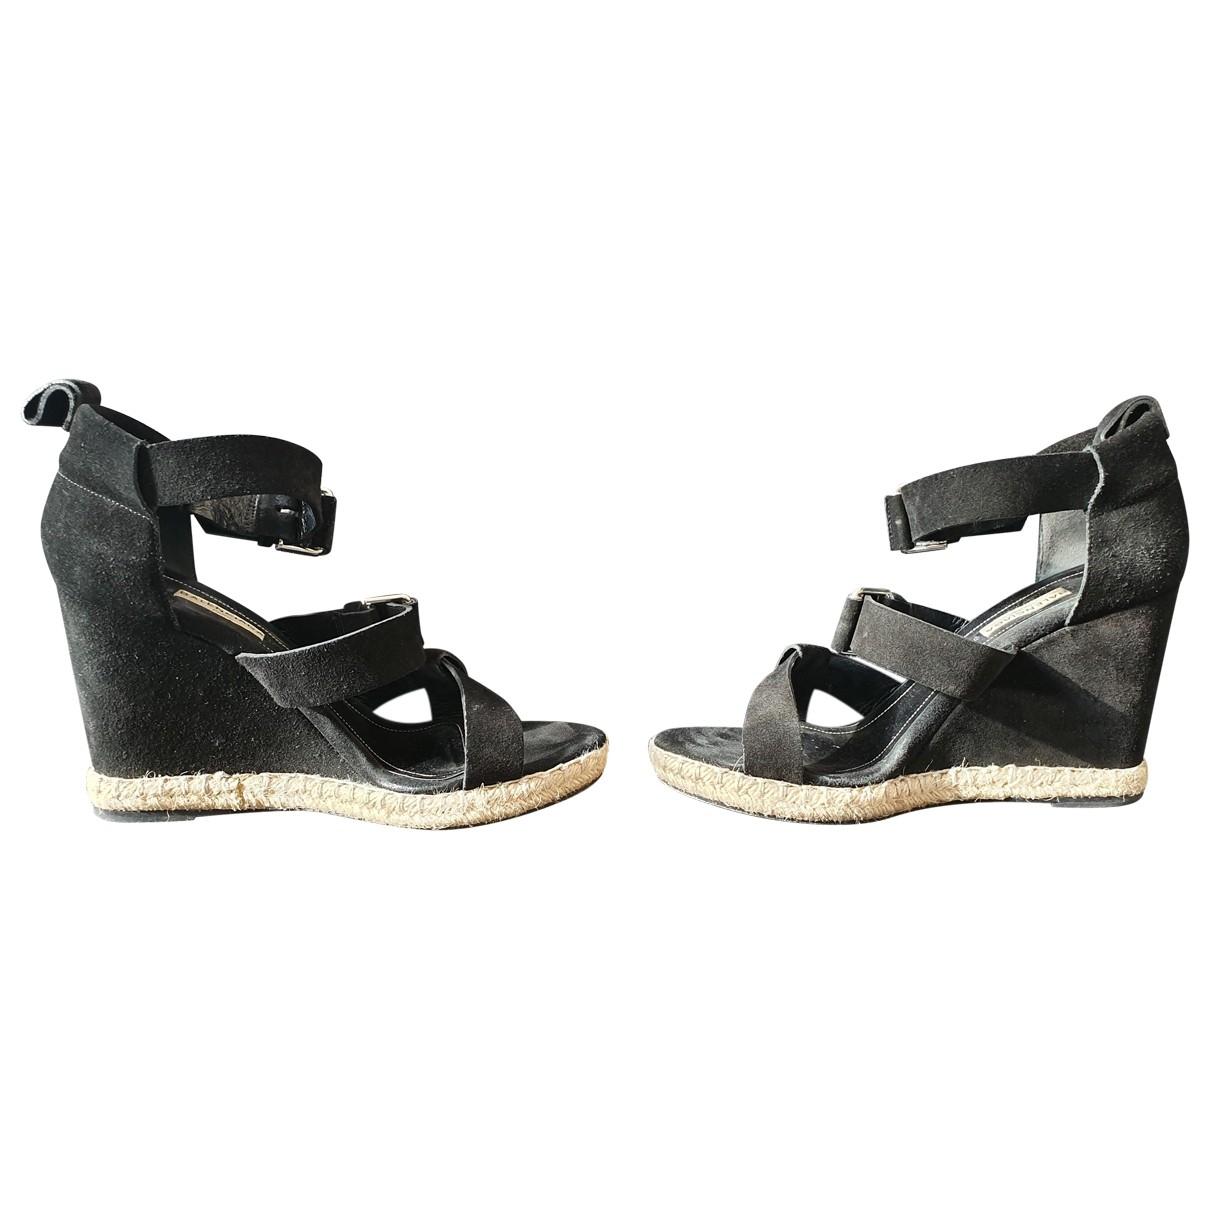 Balenciaga - Espadrilles   pour femme en suede - noir